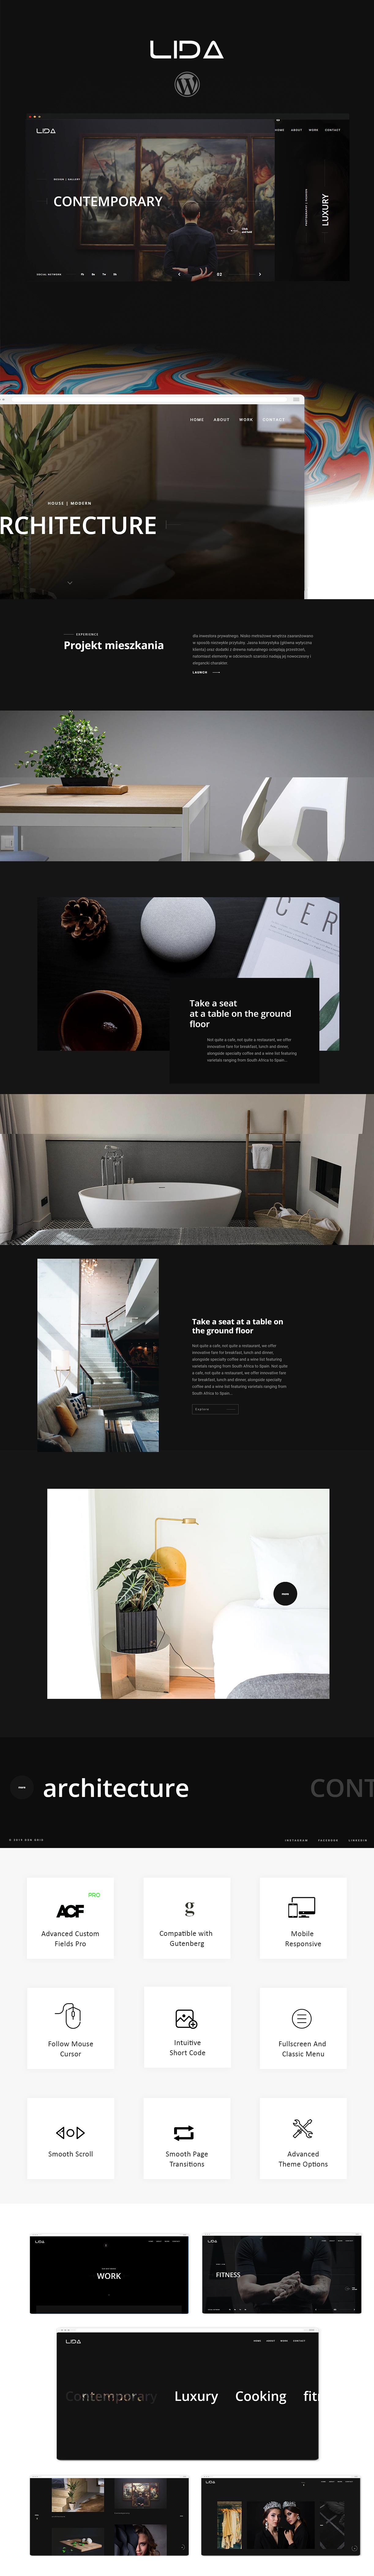 Lida - Ajax Portfolio WordPress Theme - 2